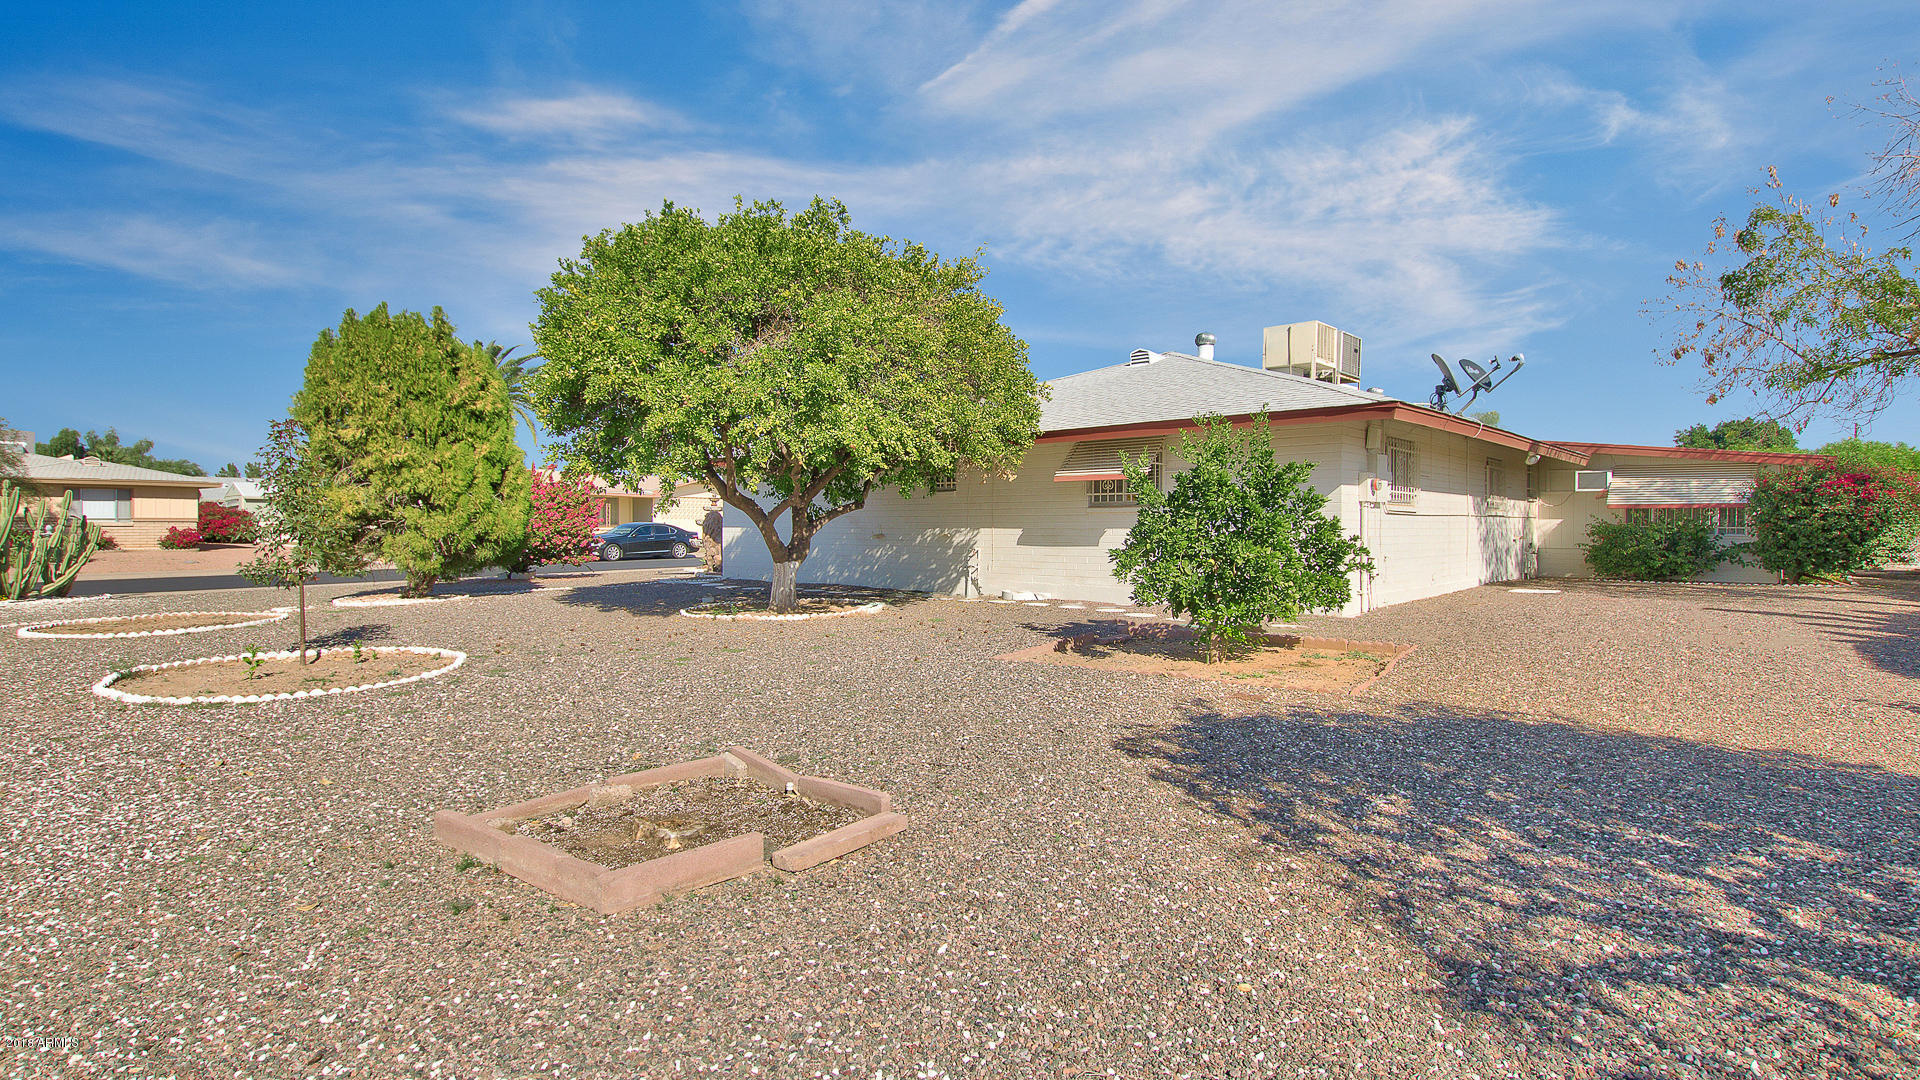 MLS 5845304 5929 E DUNCAN Street, Mesa, AZ 85205 Mesa AZ Dreamland Villa